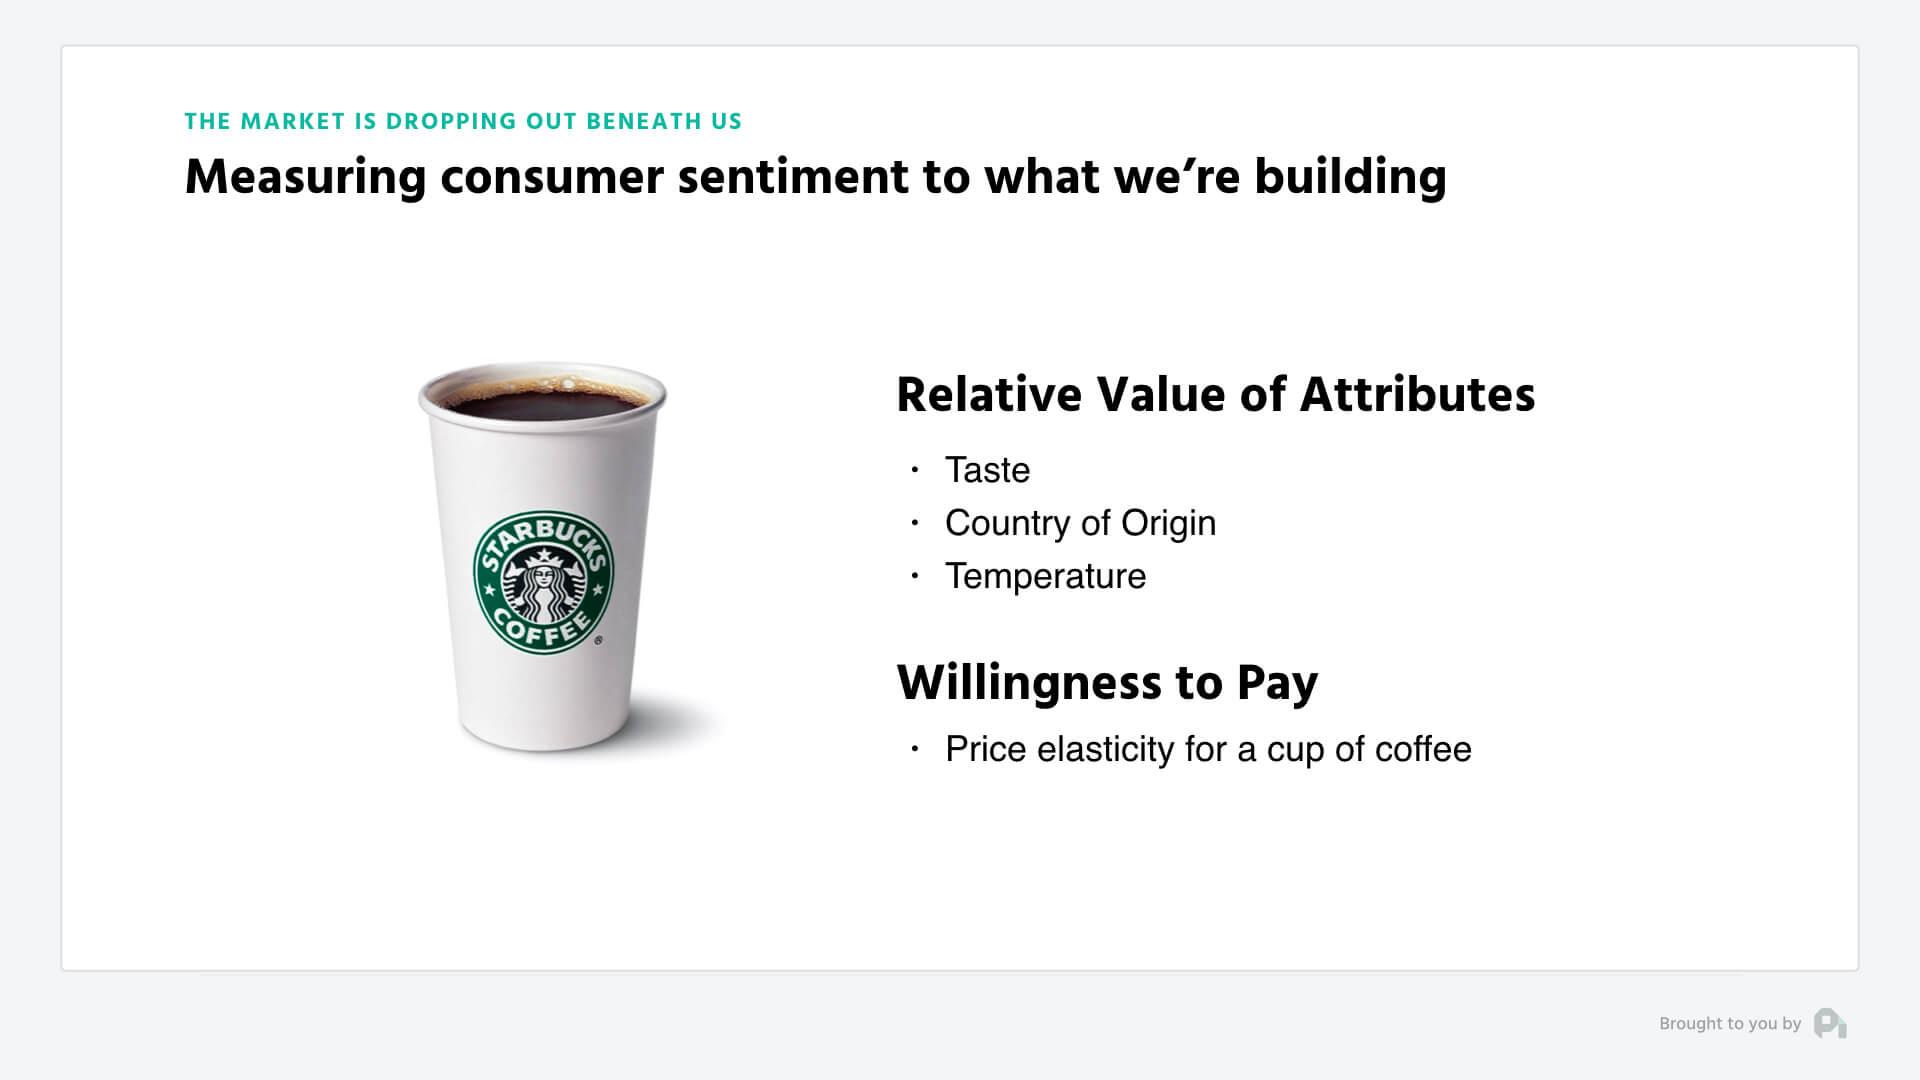 ConsumerSentimentCoffee (1)